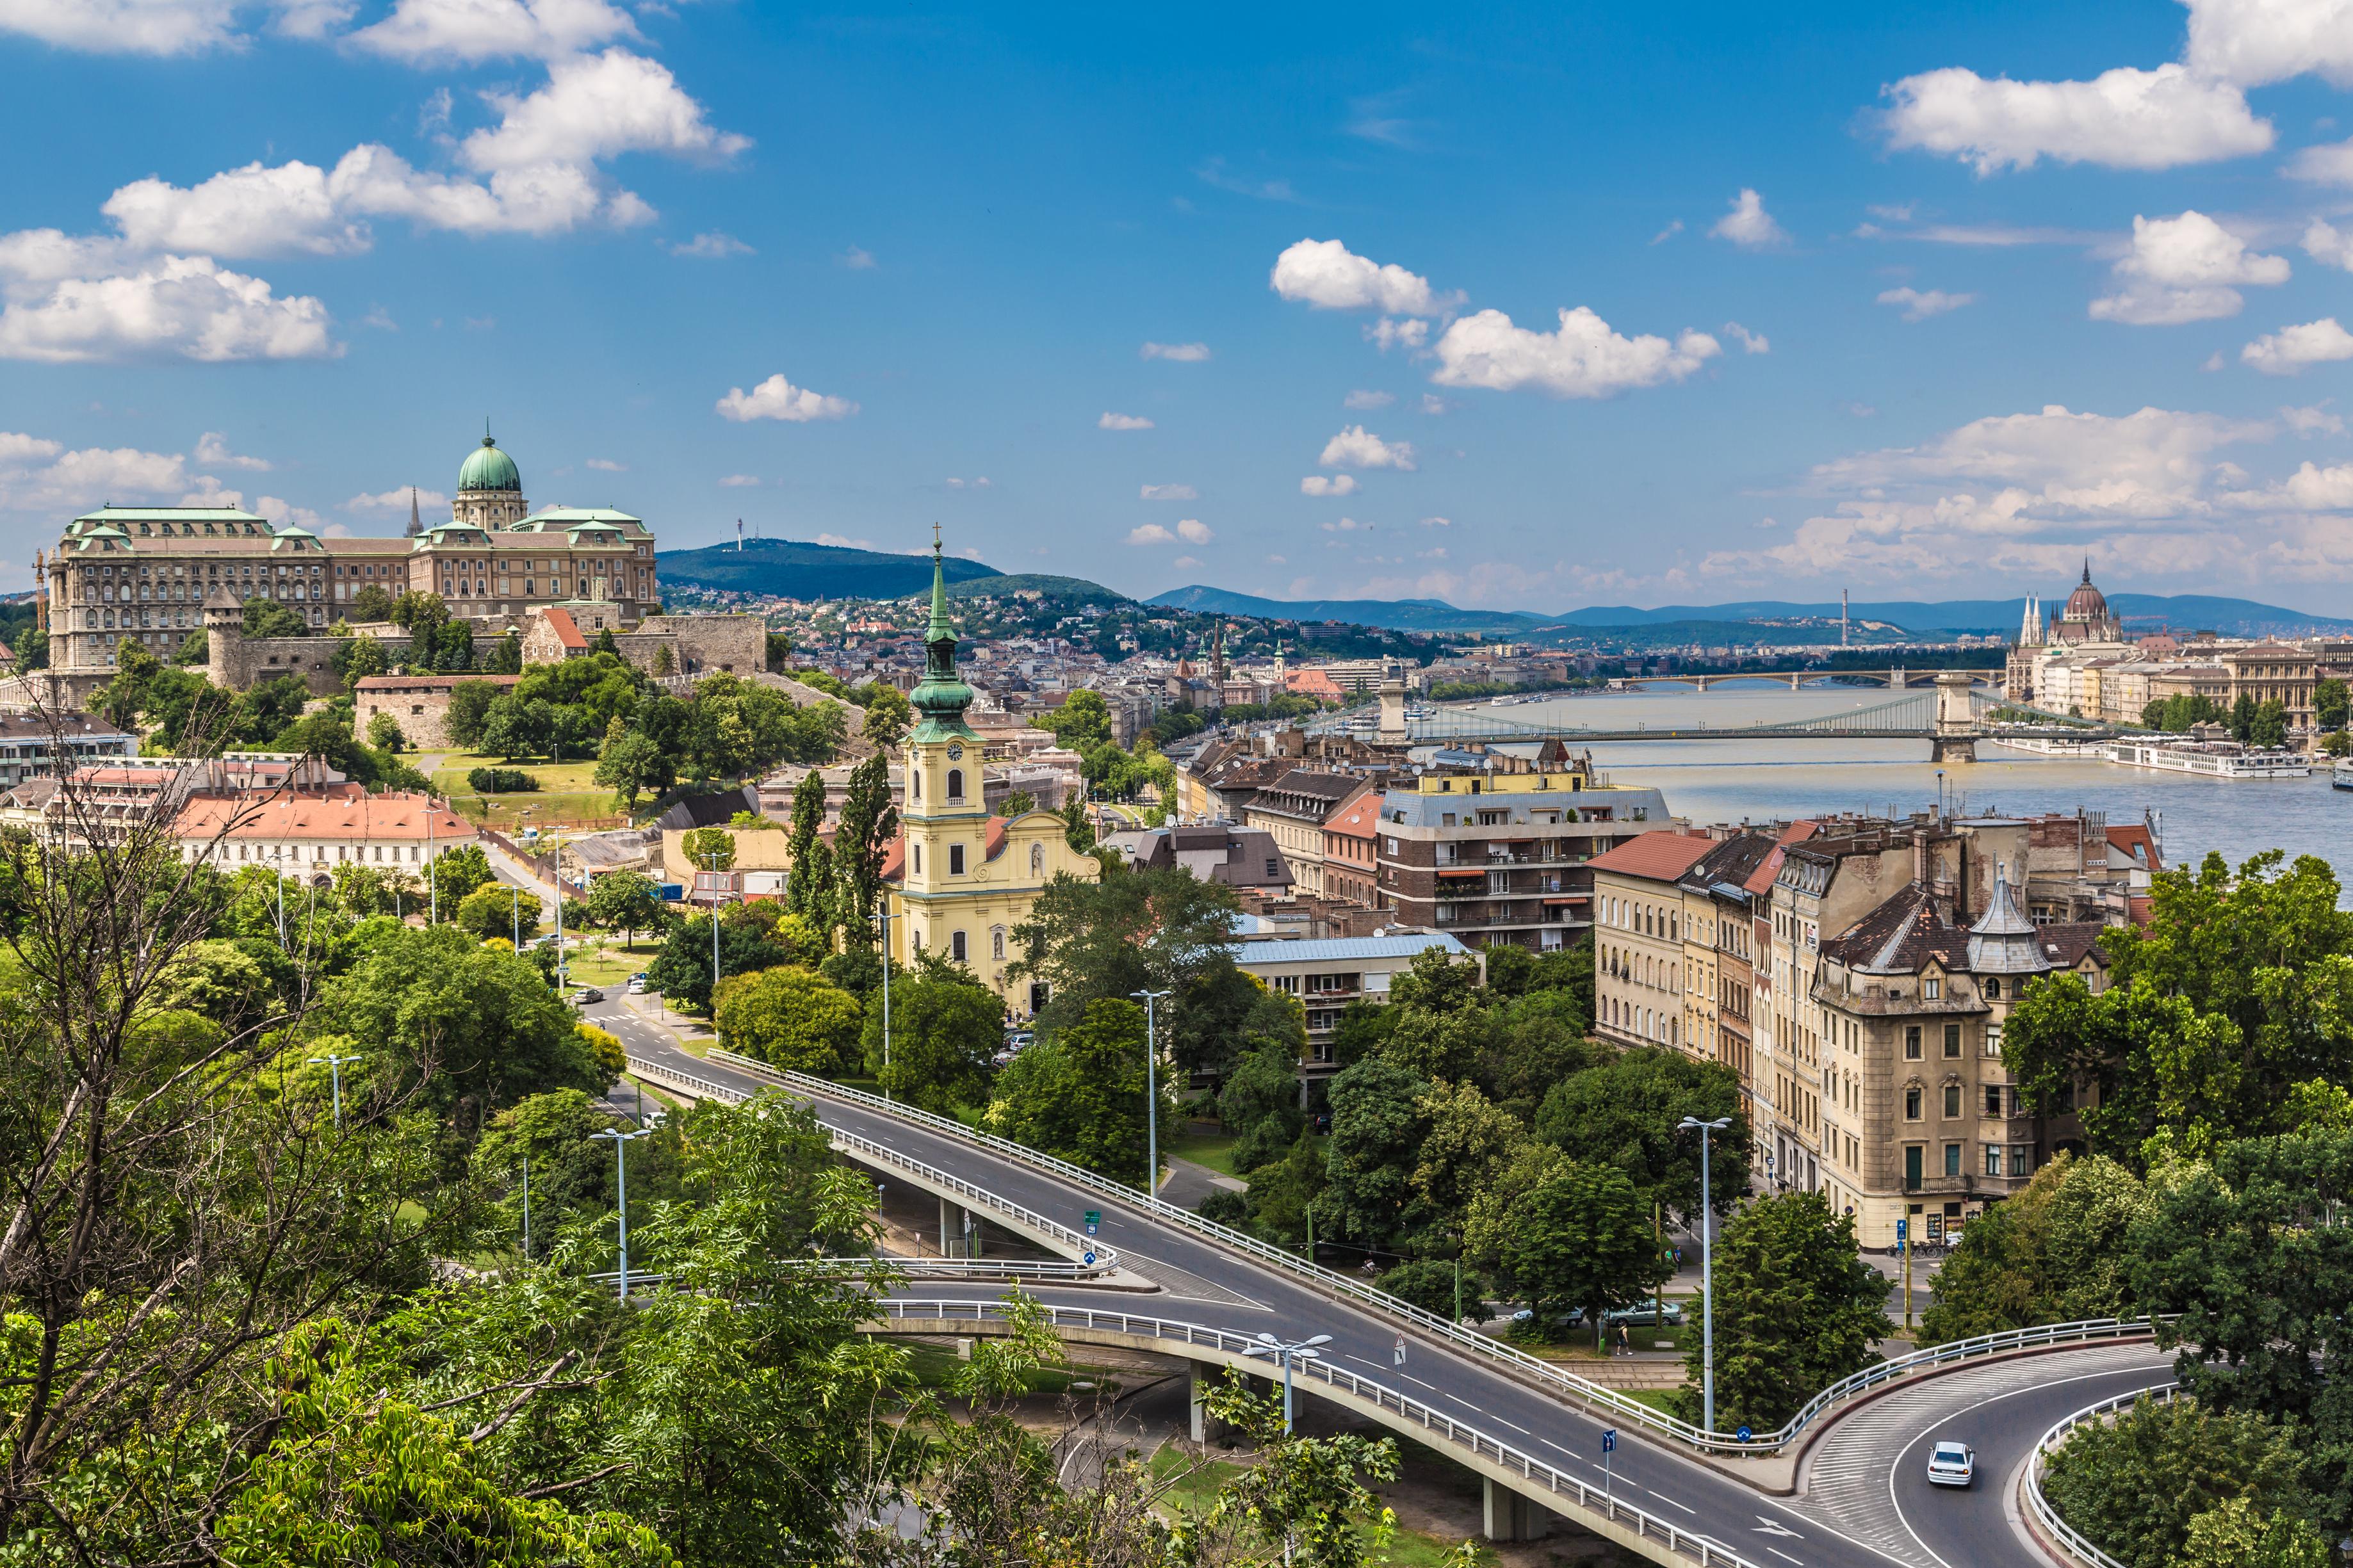 Buda Side • Budapest, Hungary